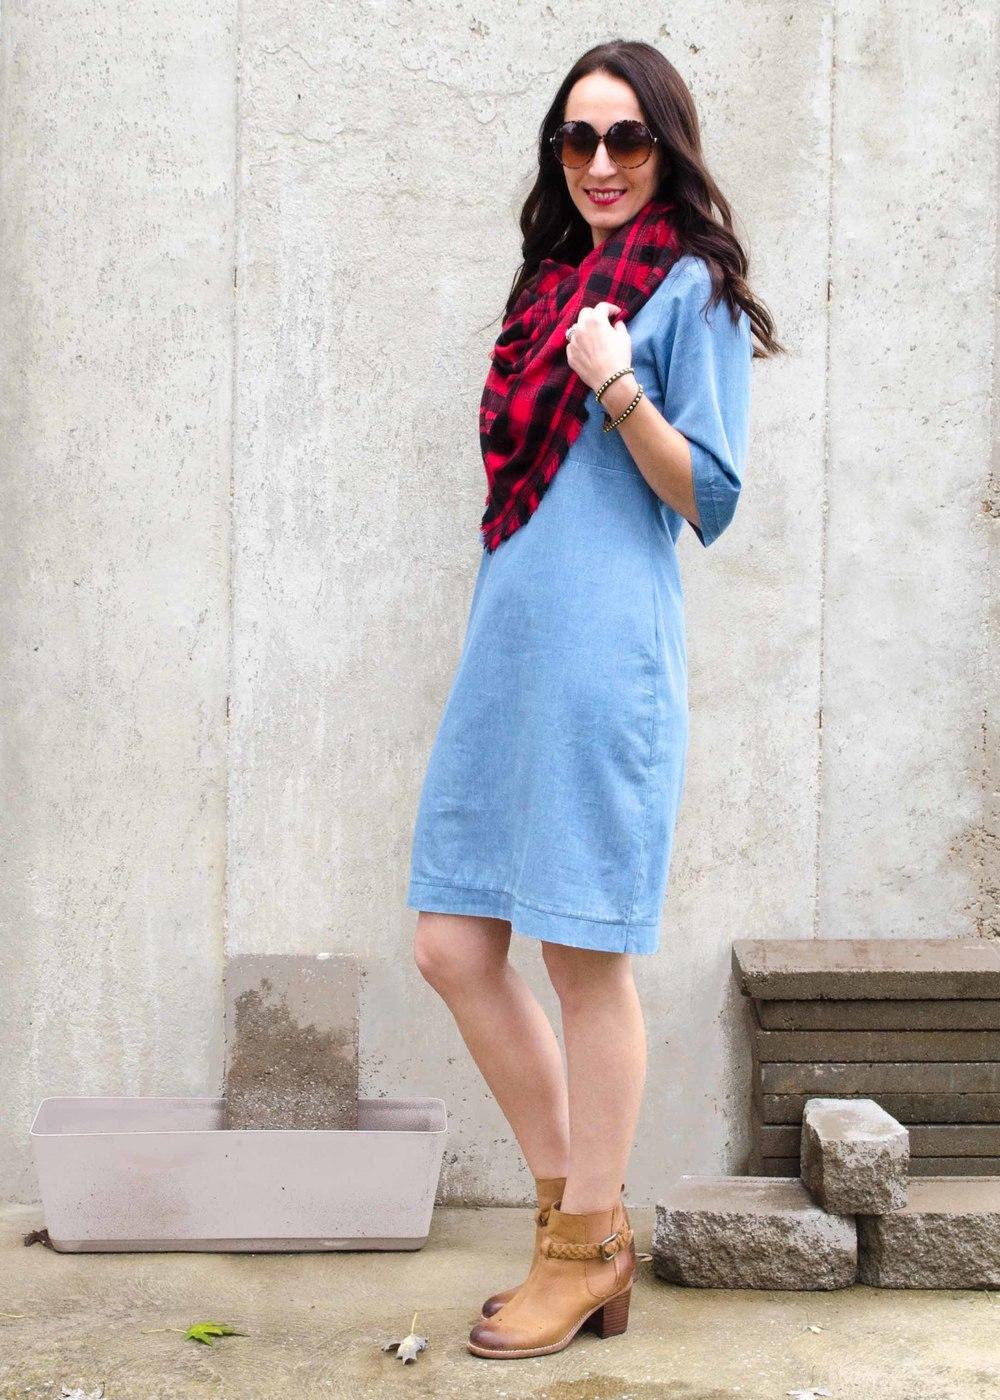 Blanket Scarf: DIY (No Sew) Flannel Blanket Scarf Tutorial | Boots: Sperry